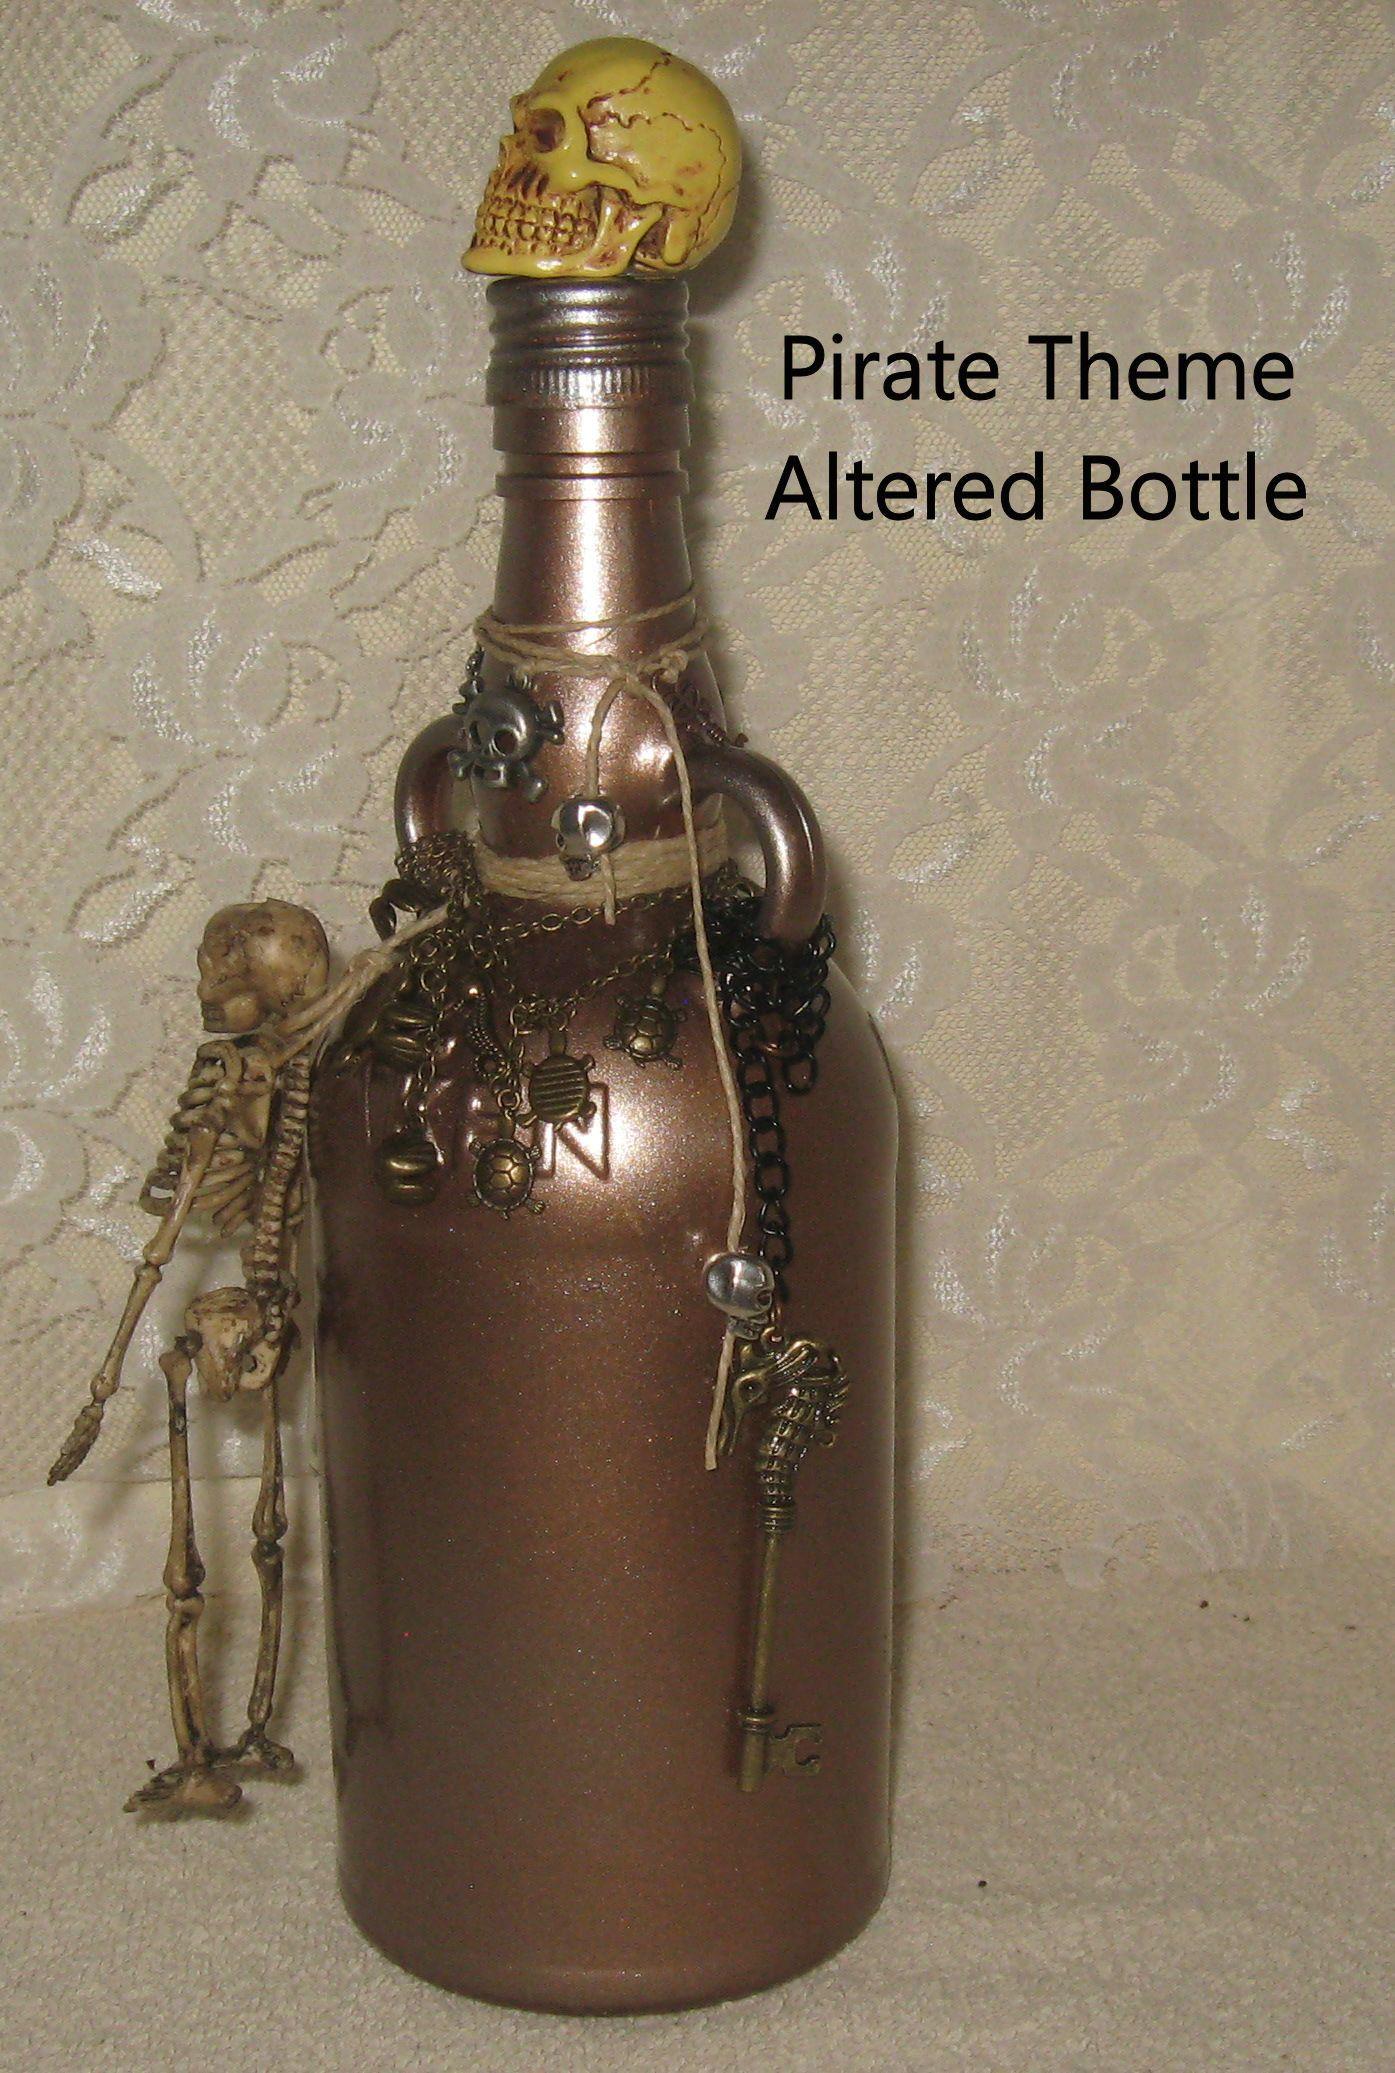 Altered Bottles Pirate Theme Bottle Upcycled Glass Bottle